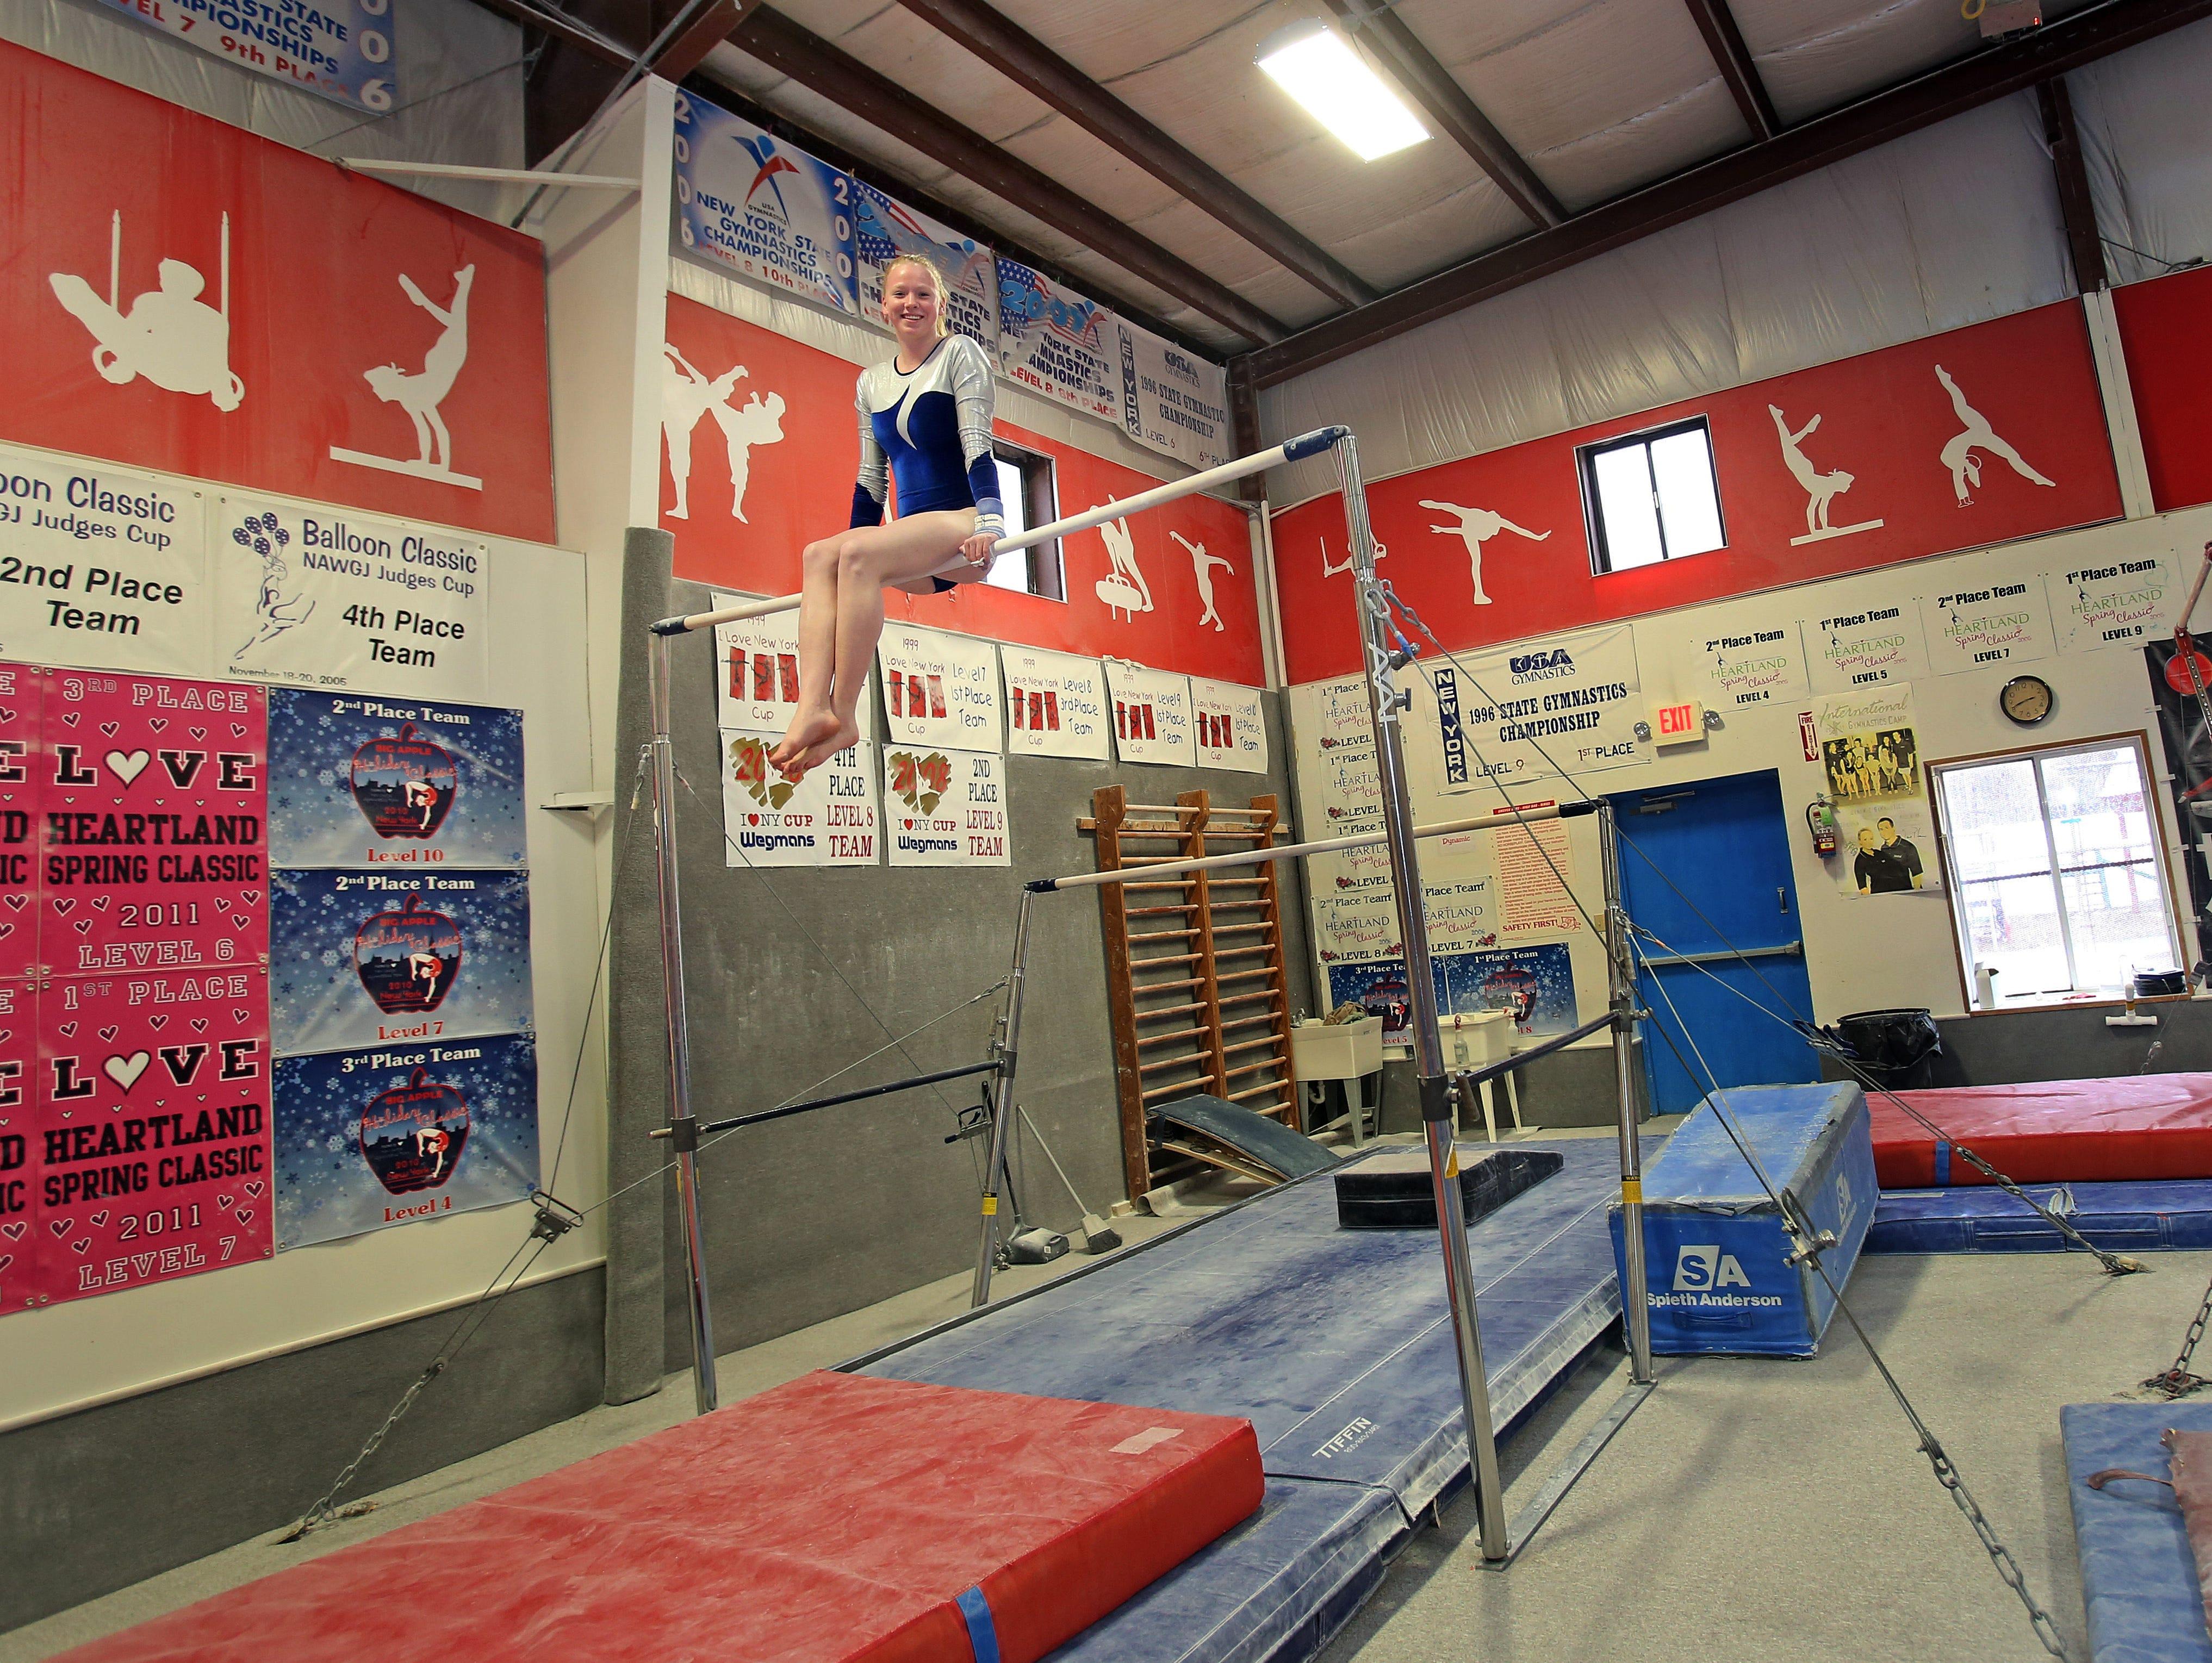 Mahopac senior Katherine Dorovitsine is the Journal New/lohud co-gymnast of the Year with teammate Callie Johanson.